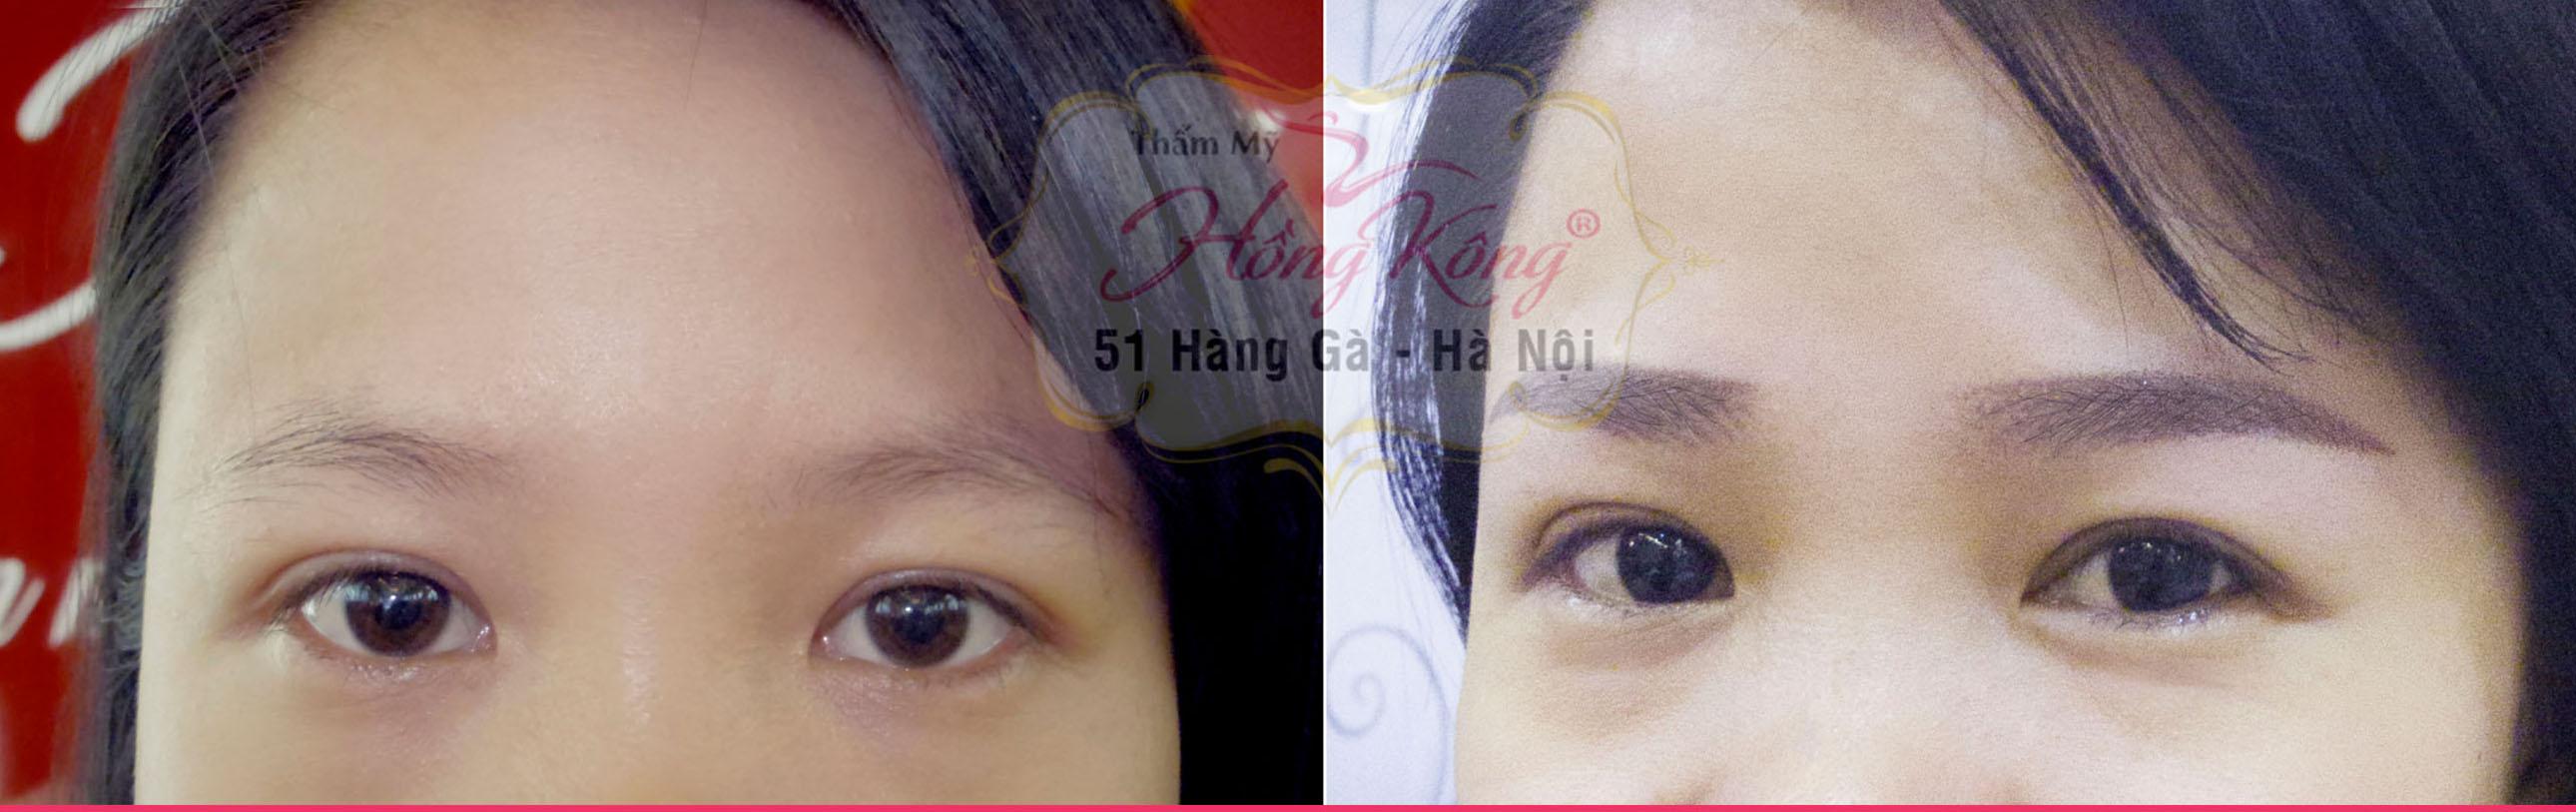 phun-theu-long-may-ngang-tiep-tuc-con-sot-2015